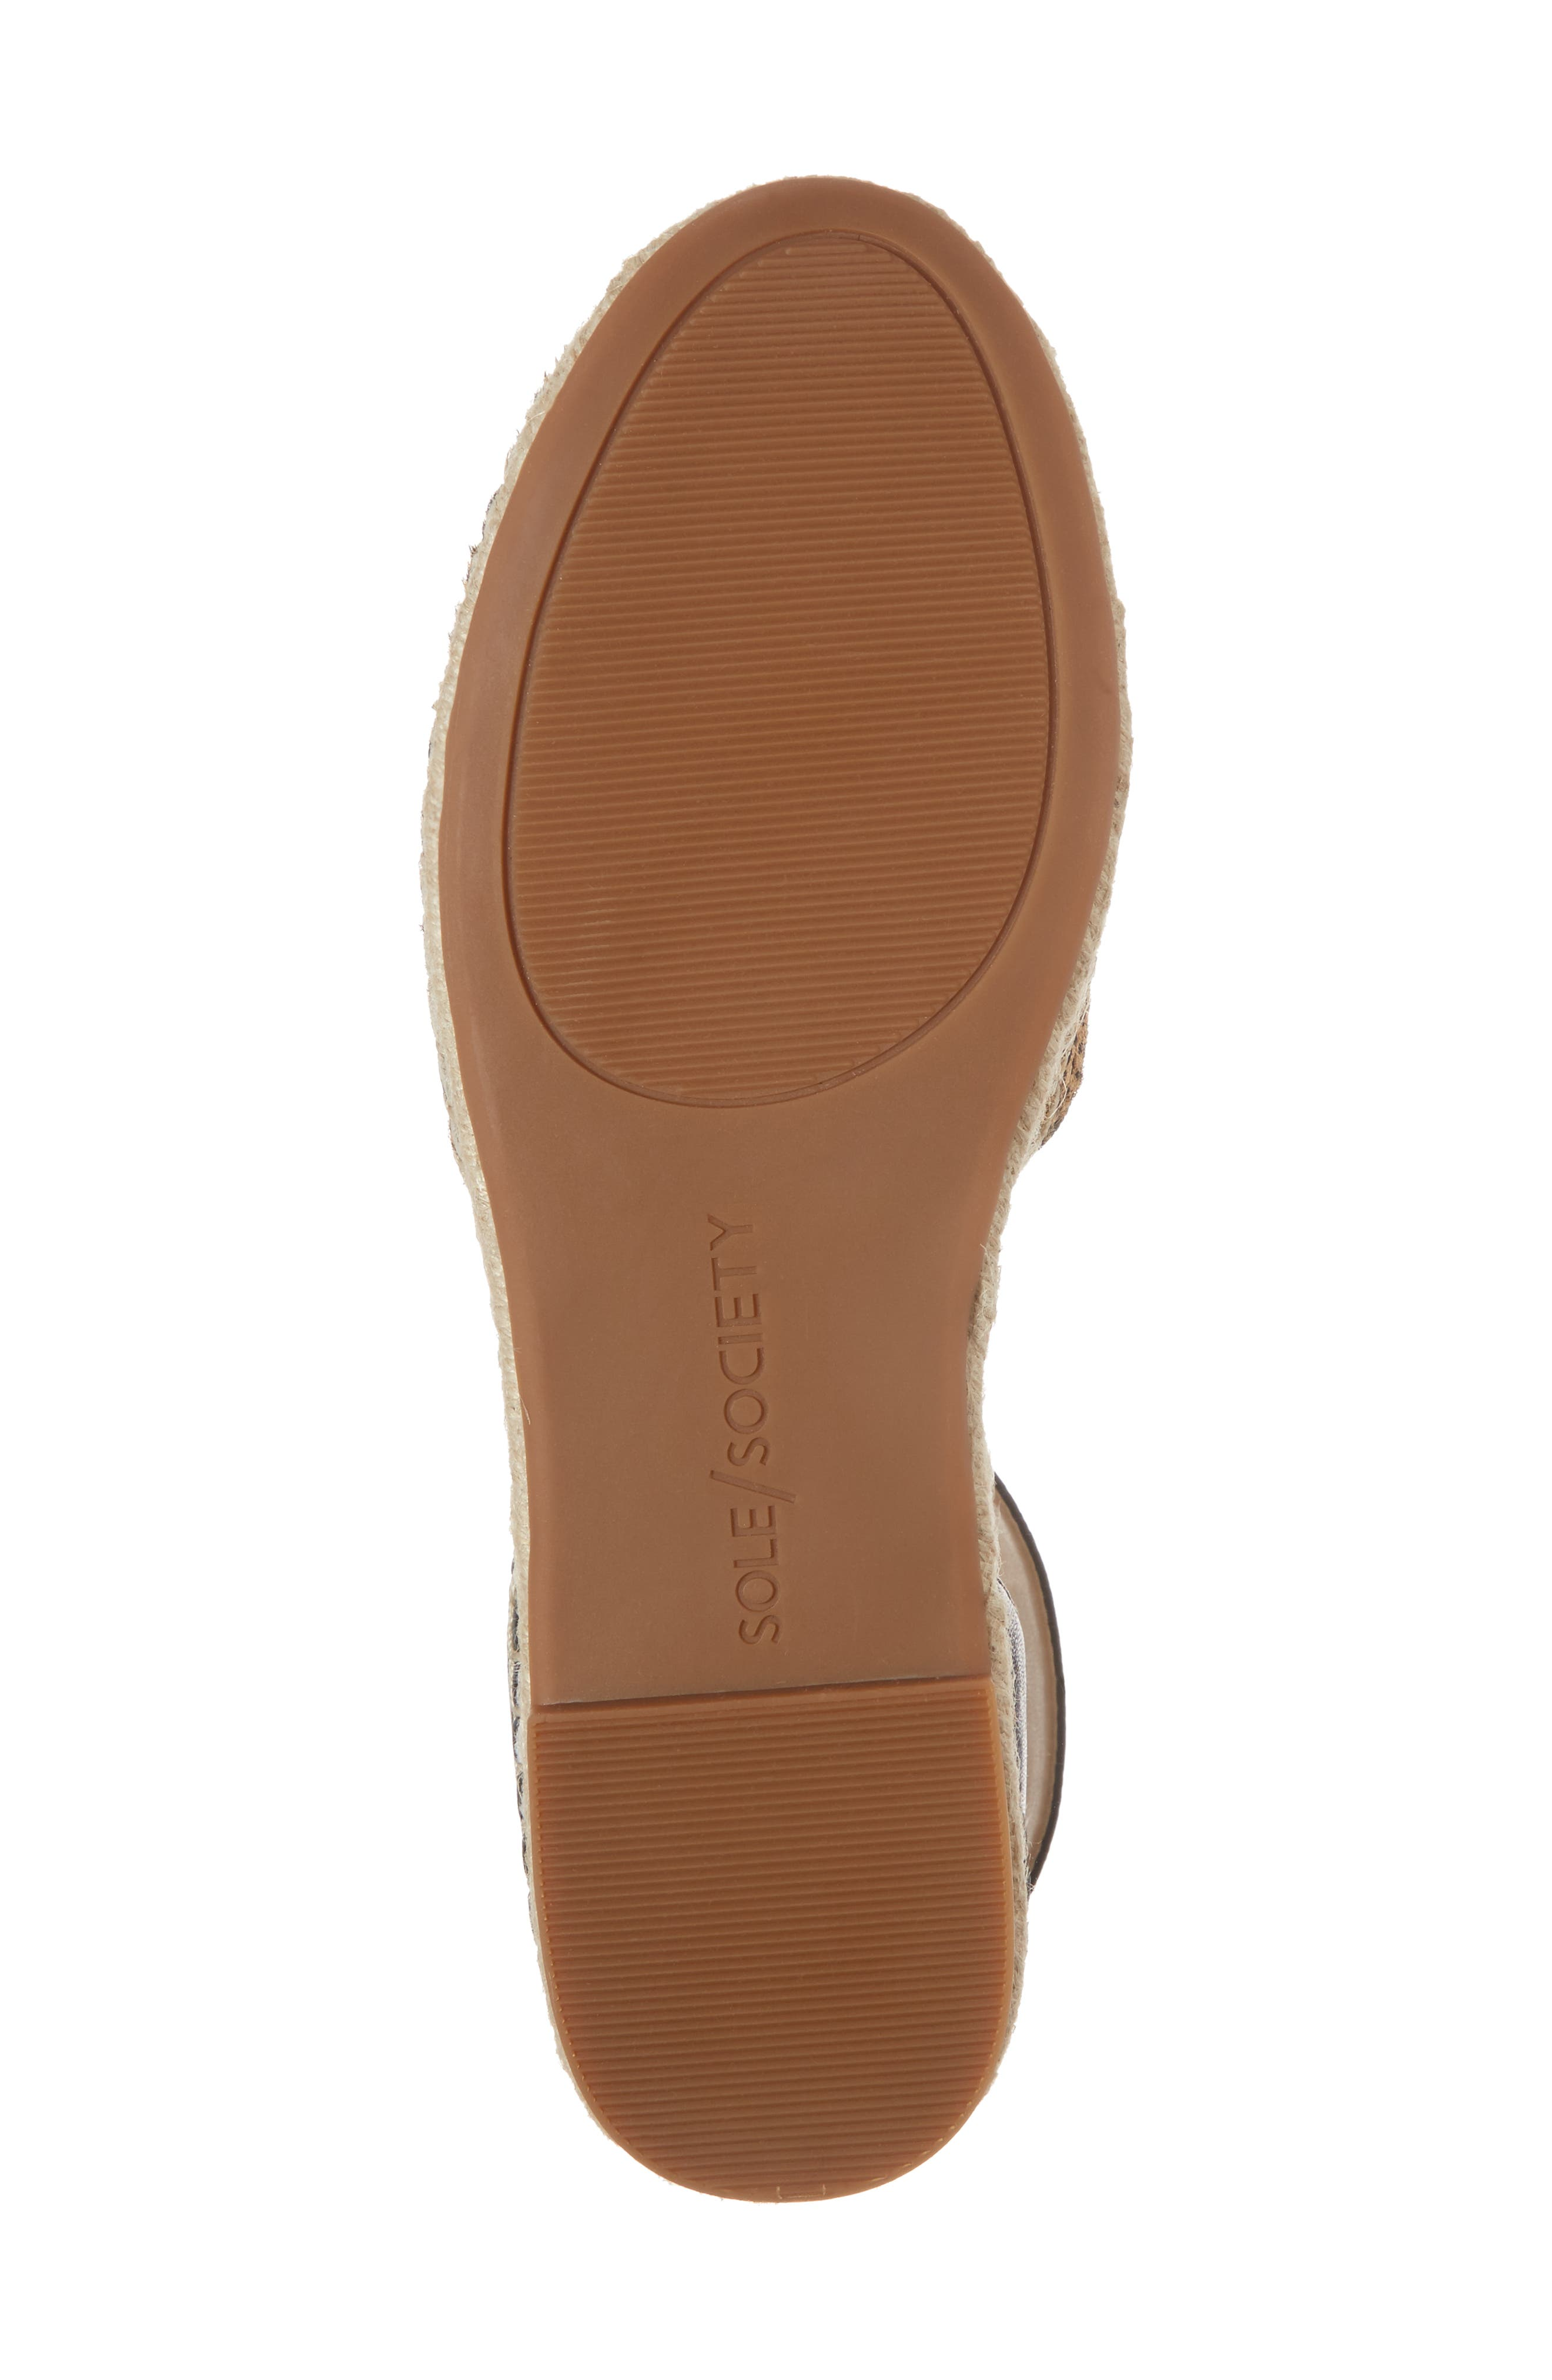 Stacie Genuine Calf Hair Espadrille Sandal,                             Alternate thumbnail 6, color,                             Dotted Haircalf